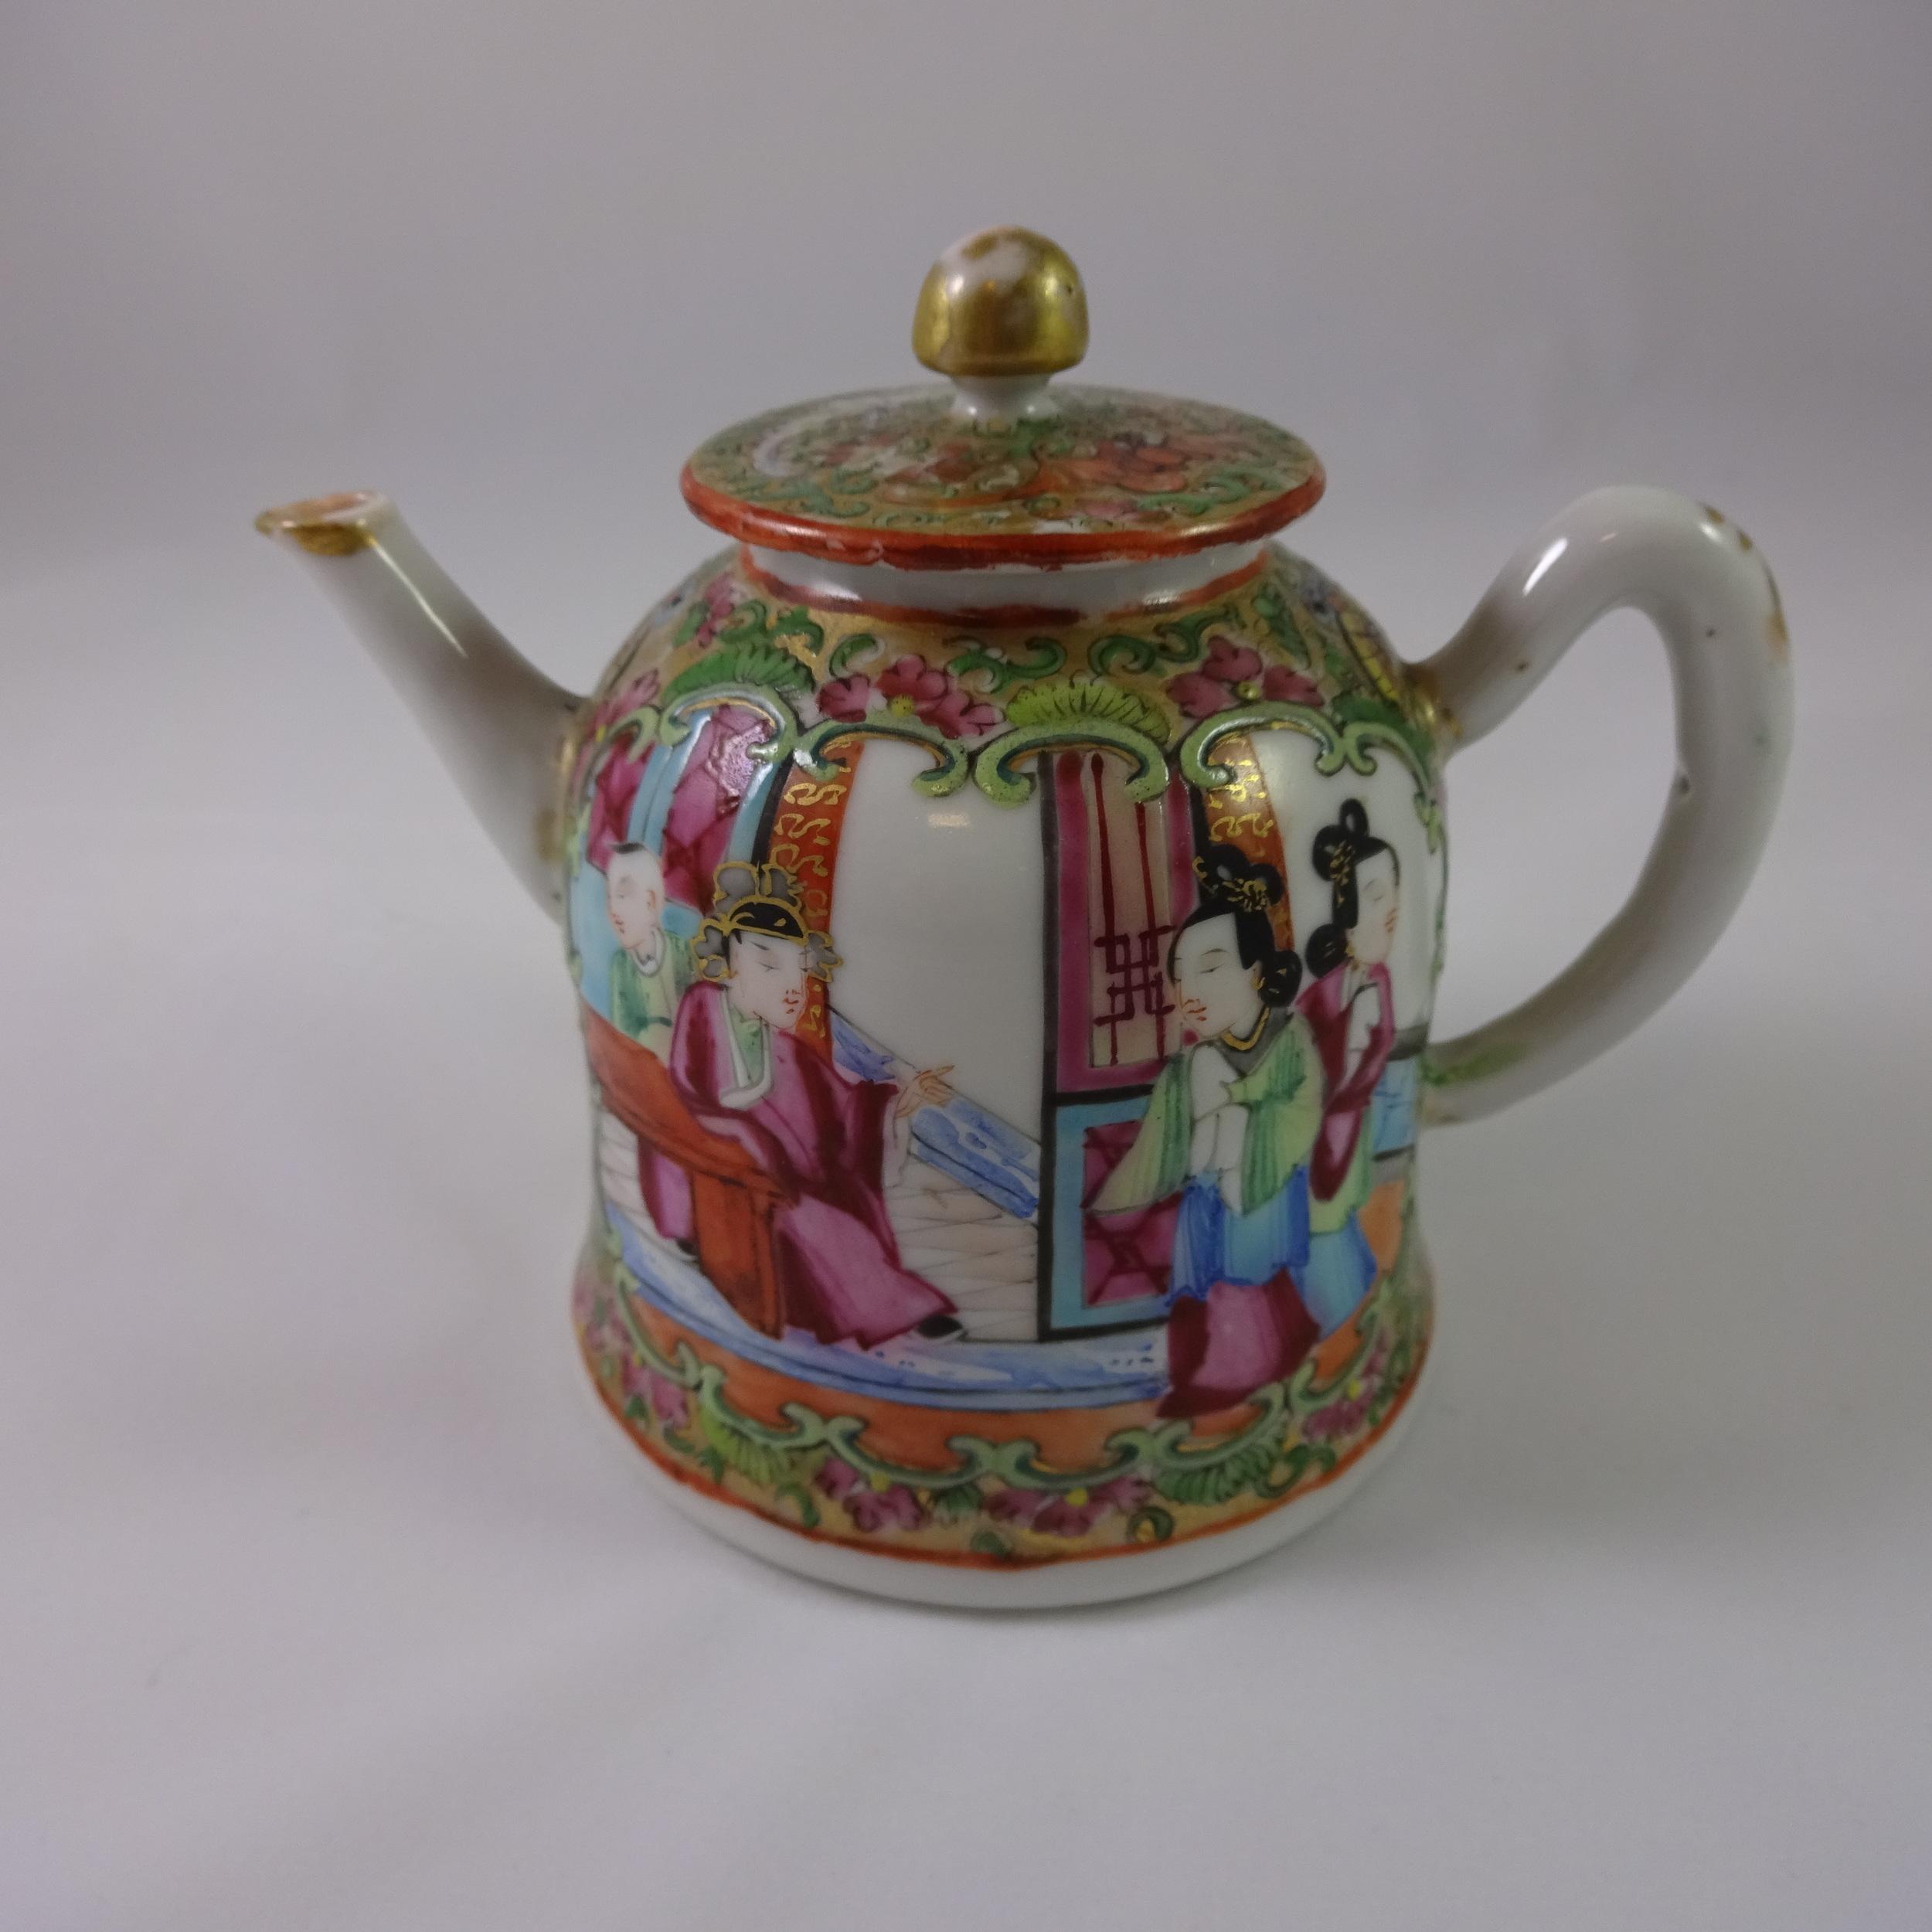 Chinese Export Rose Medallion Teapot circa 1850's